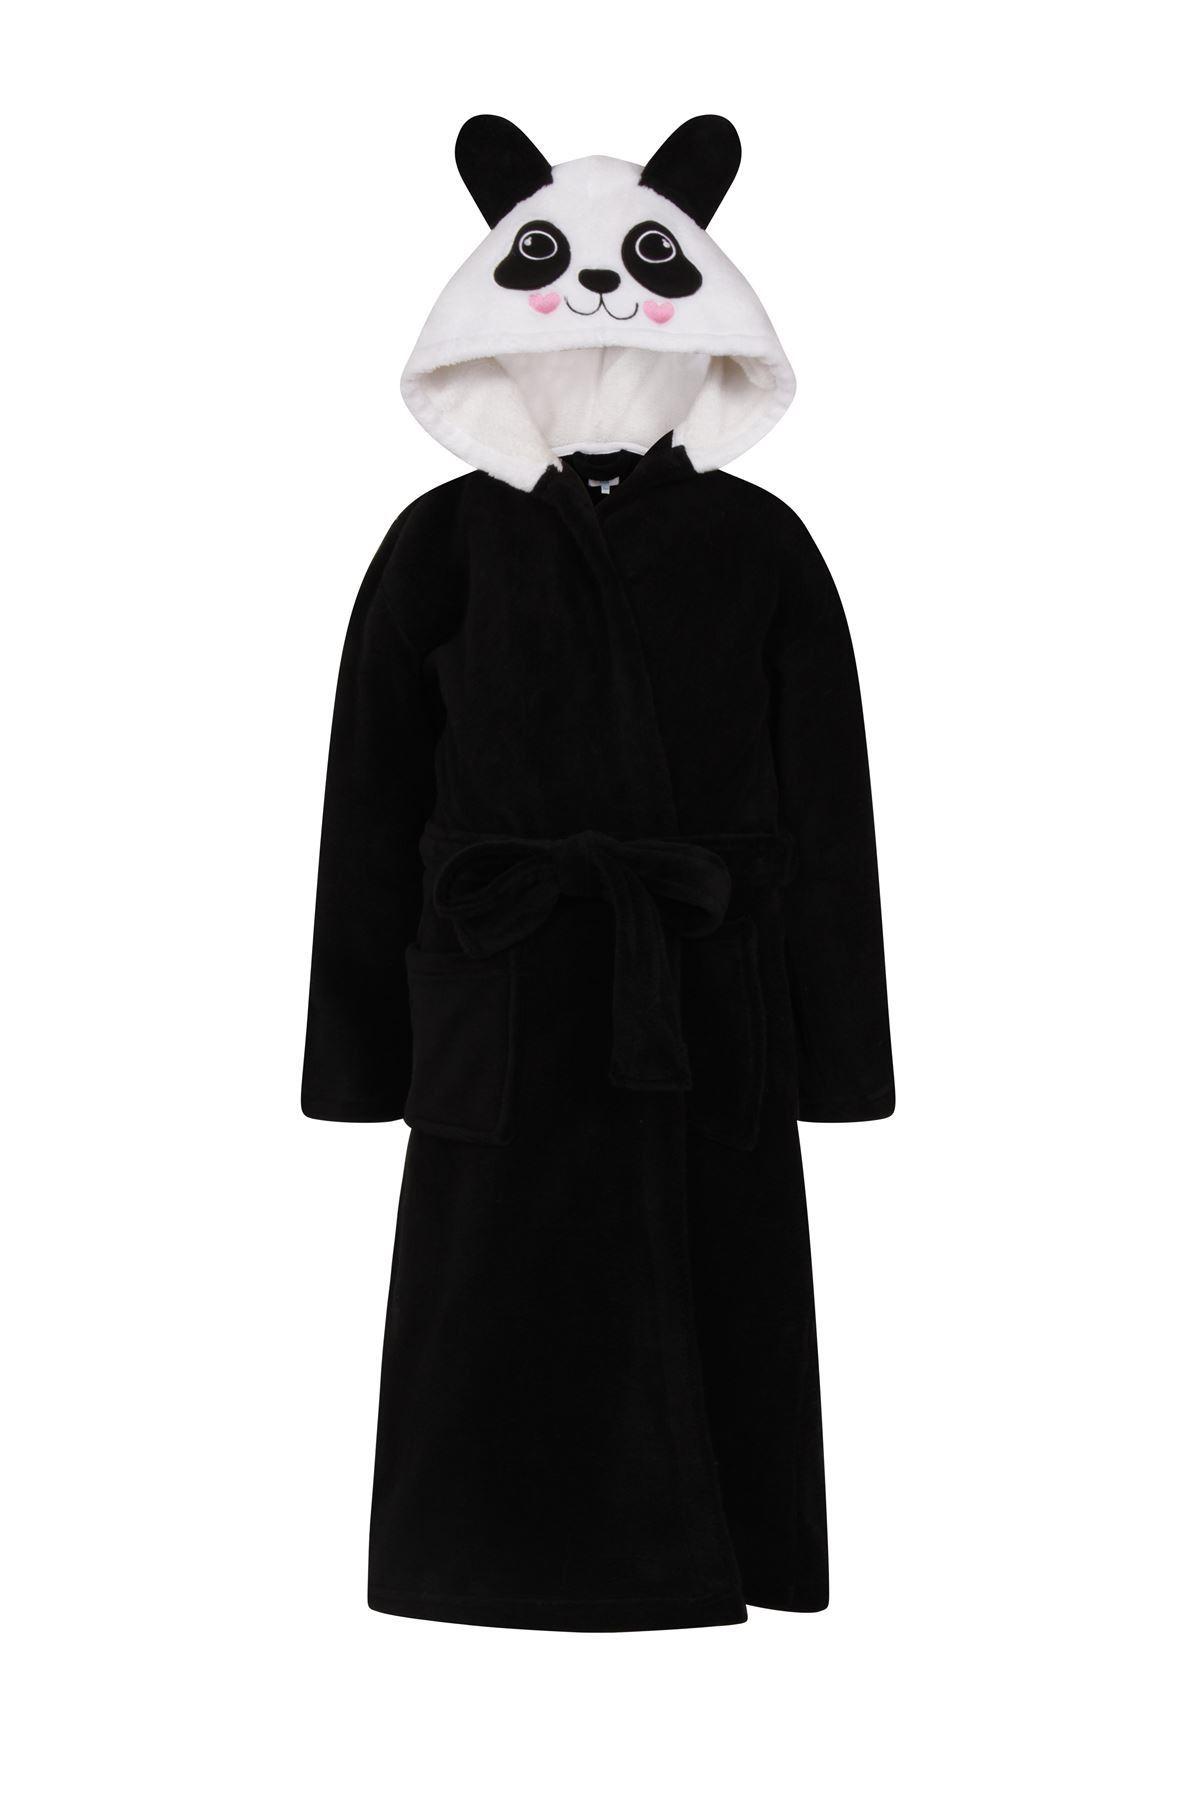 Childrens Fleece Dressing Gown Hooded Bath Robe Panda Nightwear ...